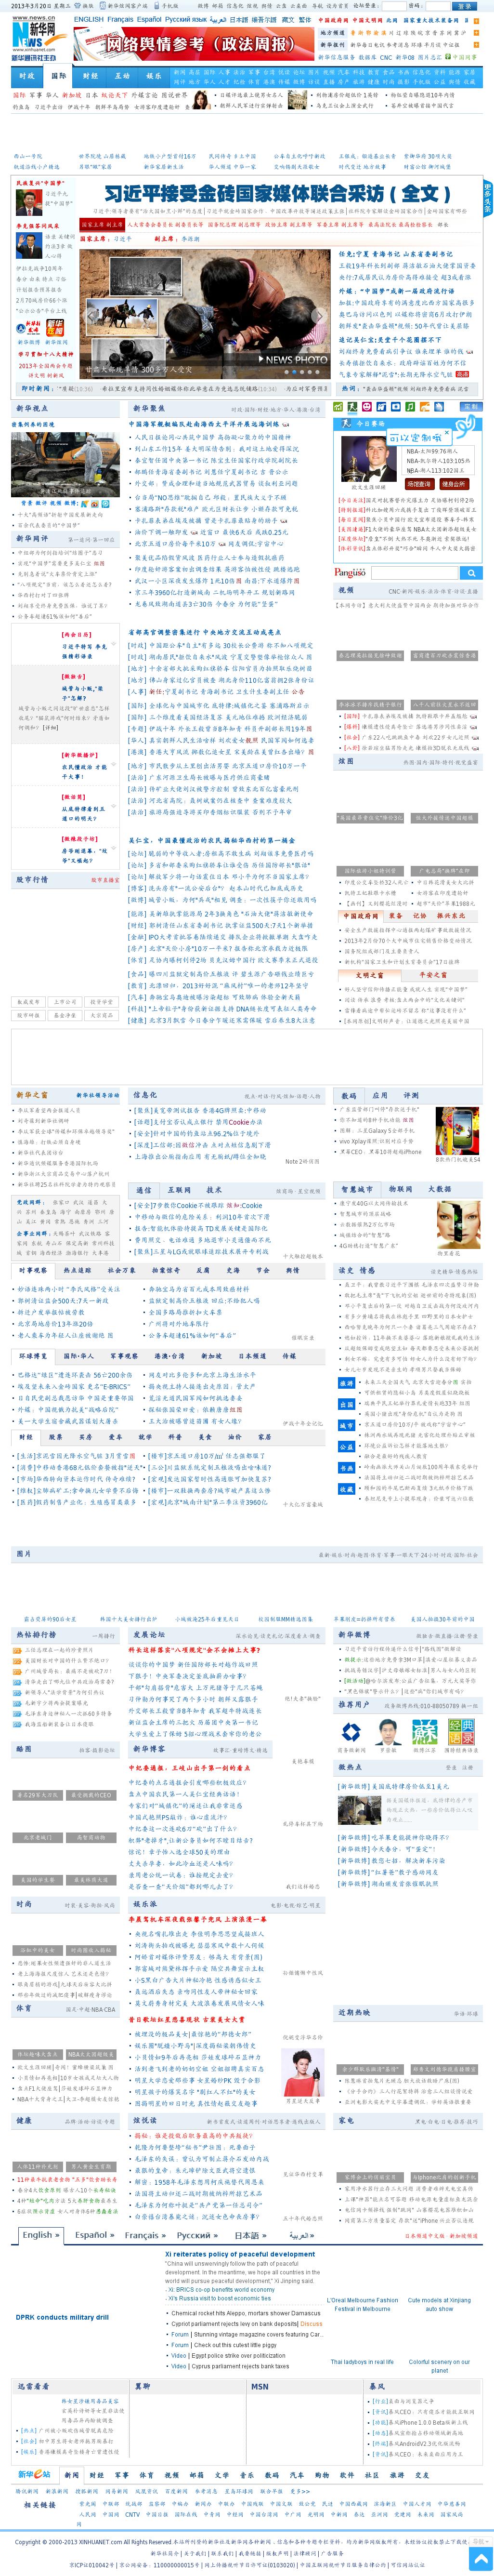 Xinhua at Wednesday March 20, 2013, 2:37 a.m. UTC